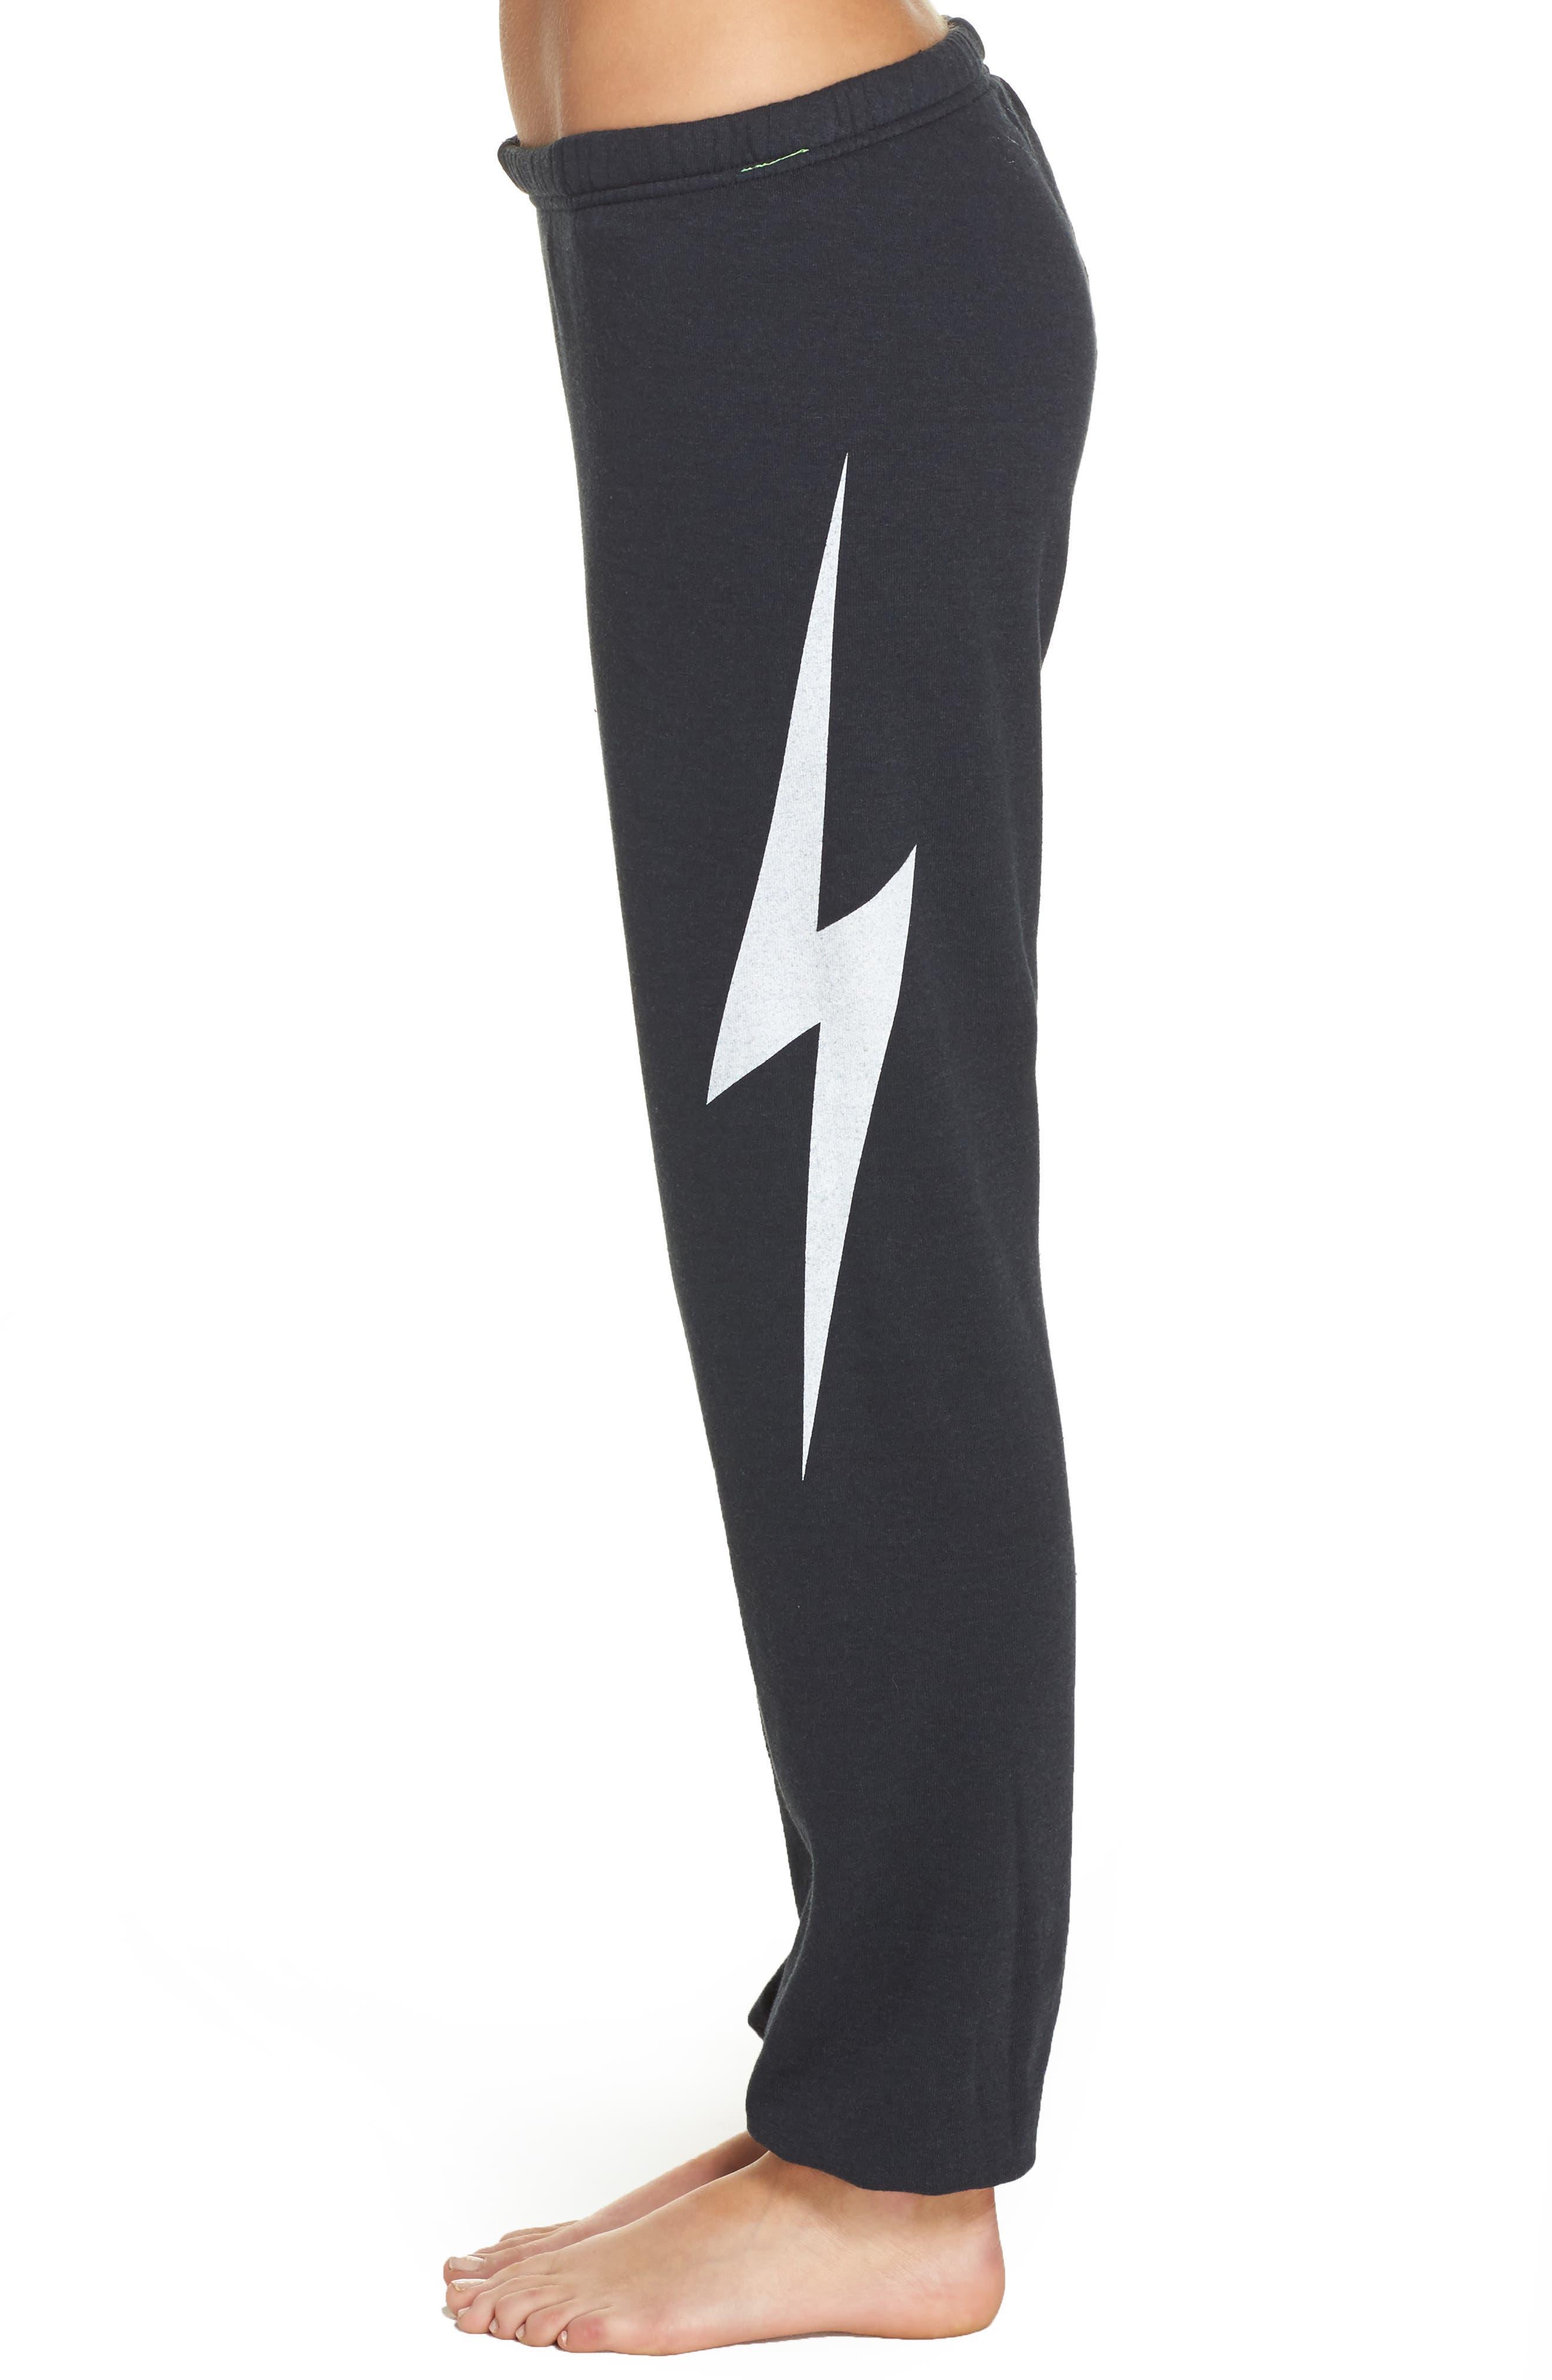 Bolt Sweatpants,                             Alternate thumbnail 4, color,                             Charcoal